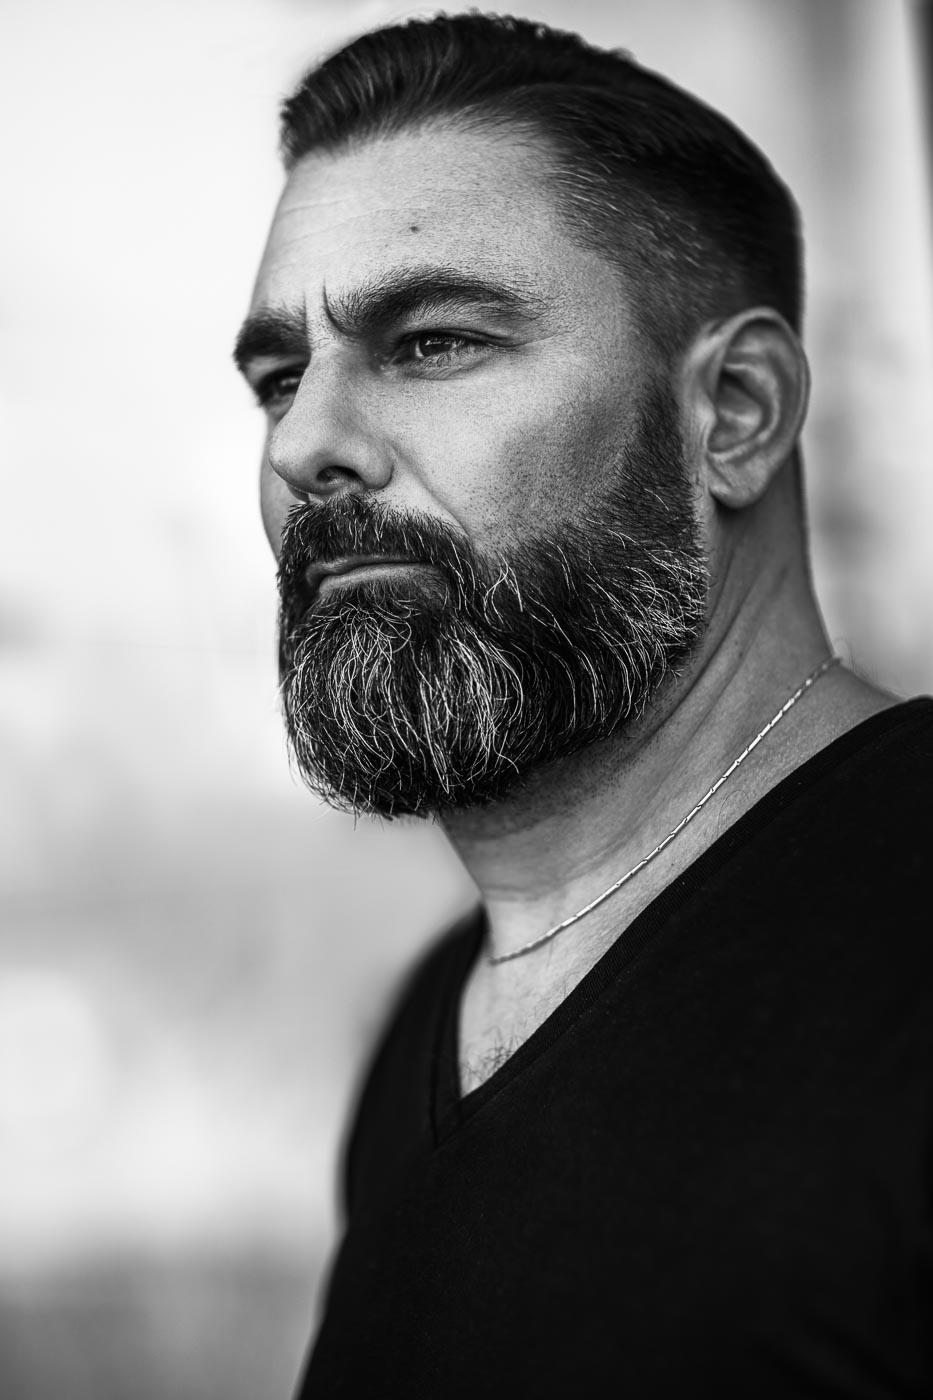 Portrait Fotografie by HENKO - Männer Portrait - Marco